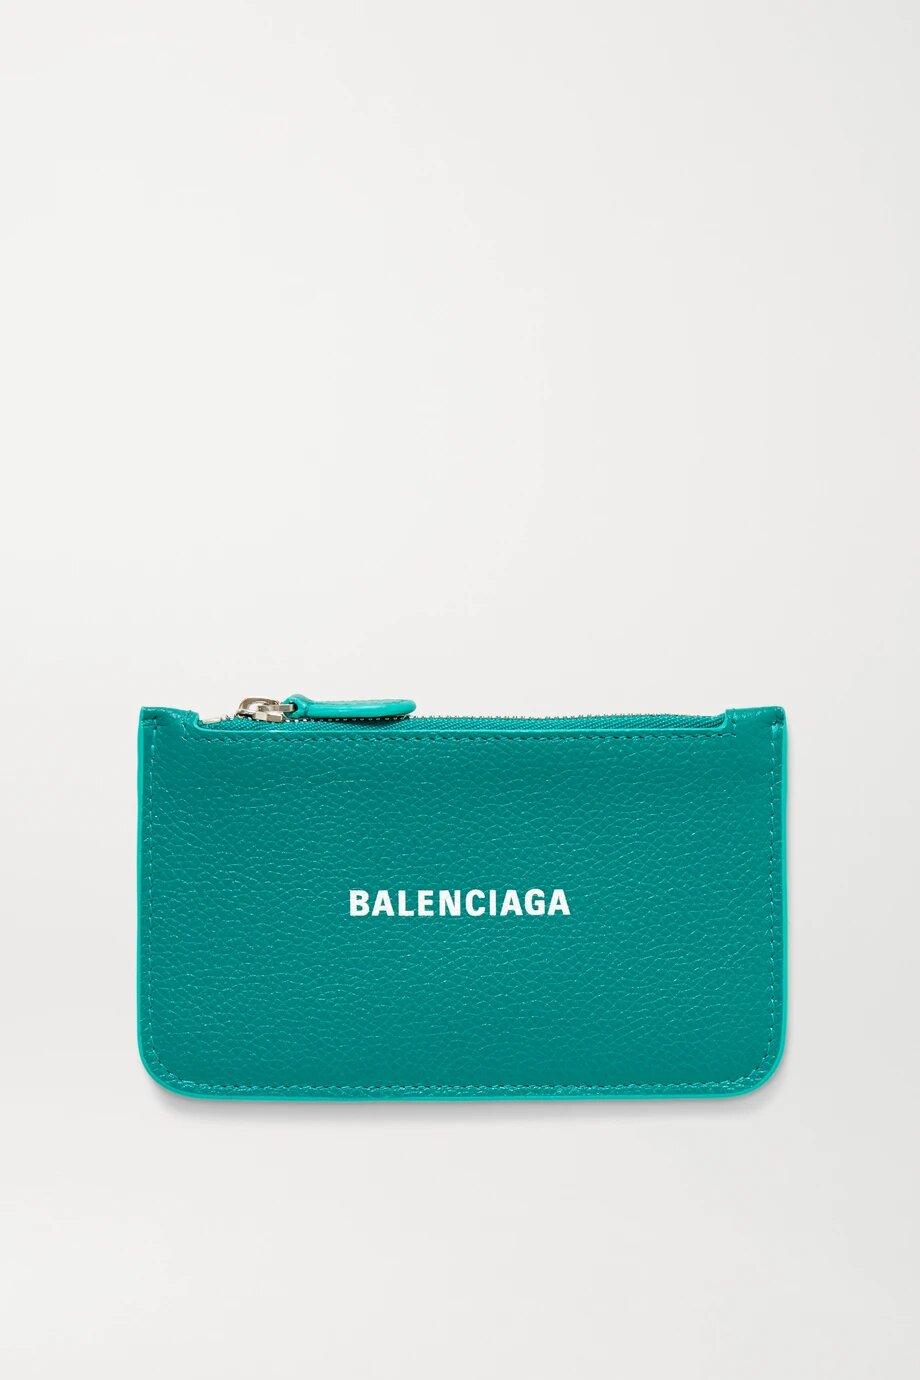 Balenciaga Cash Printed Textured-leather Wallet 381лв